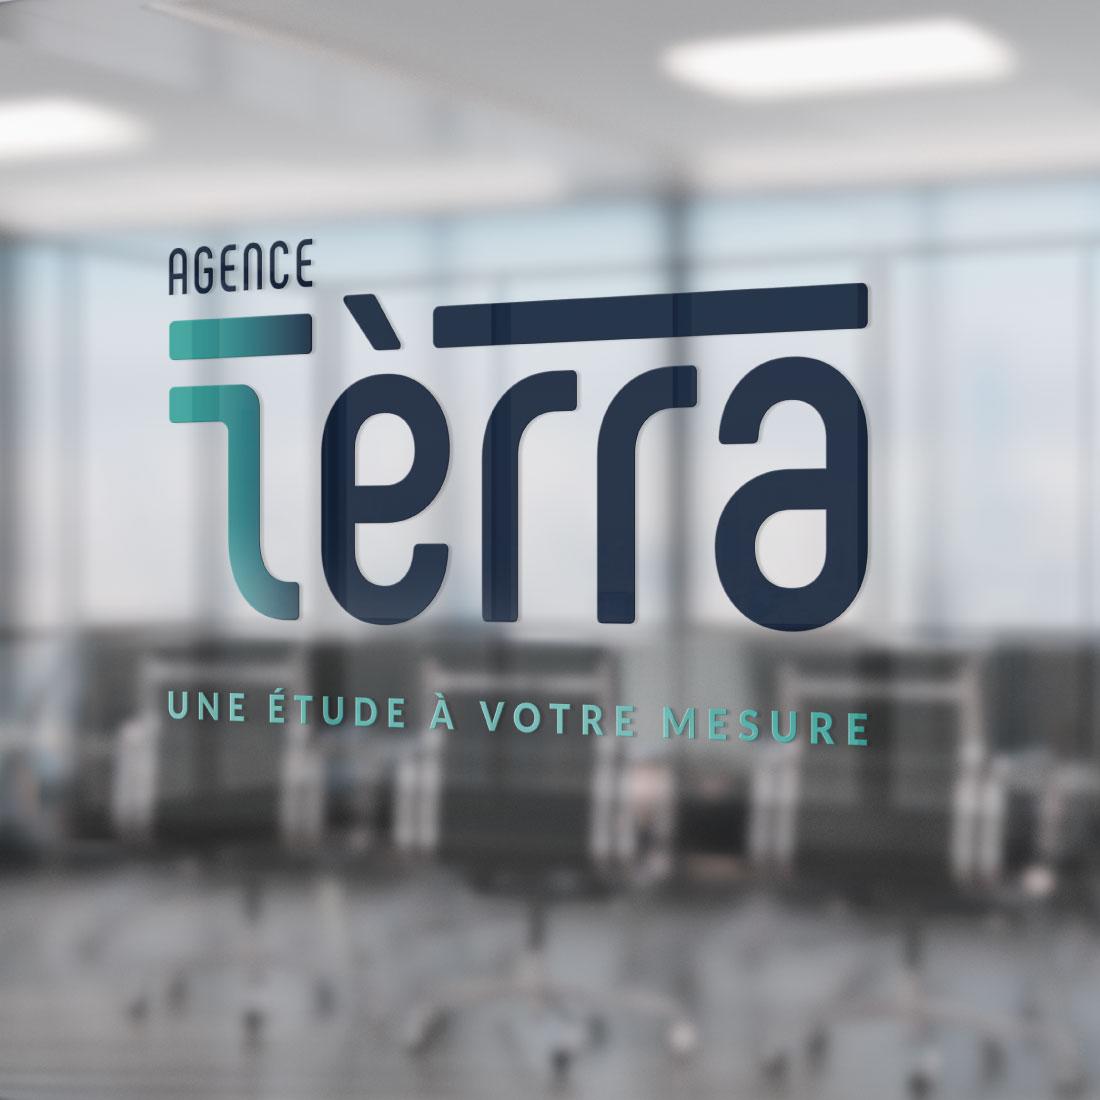 logo-agence-terra